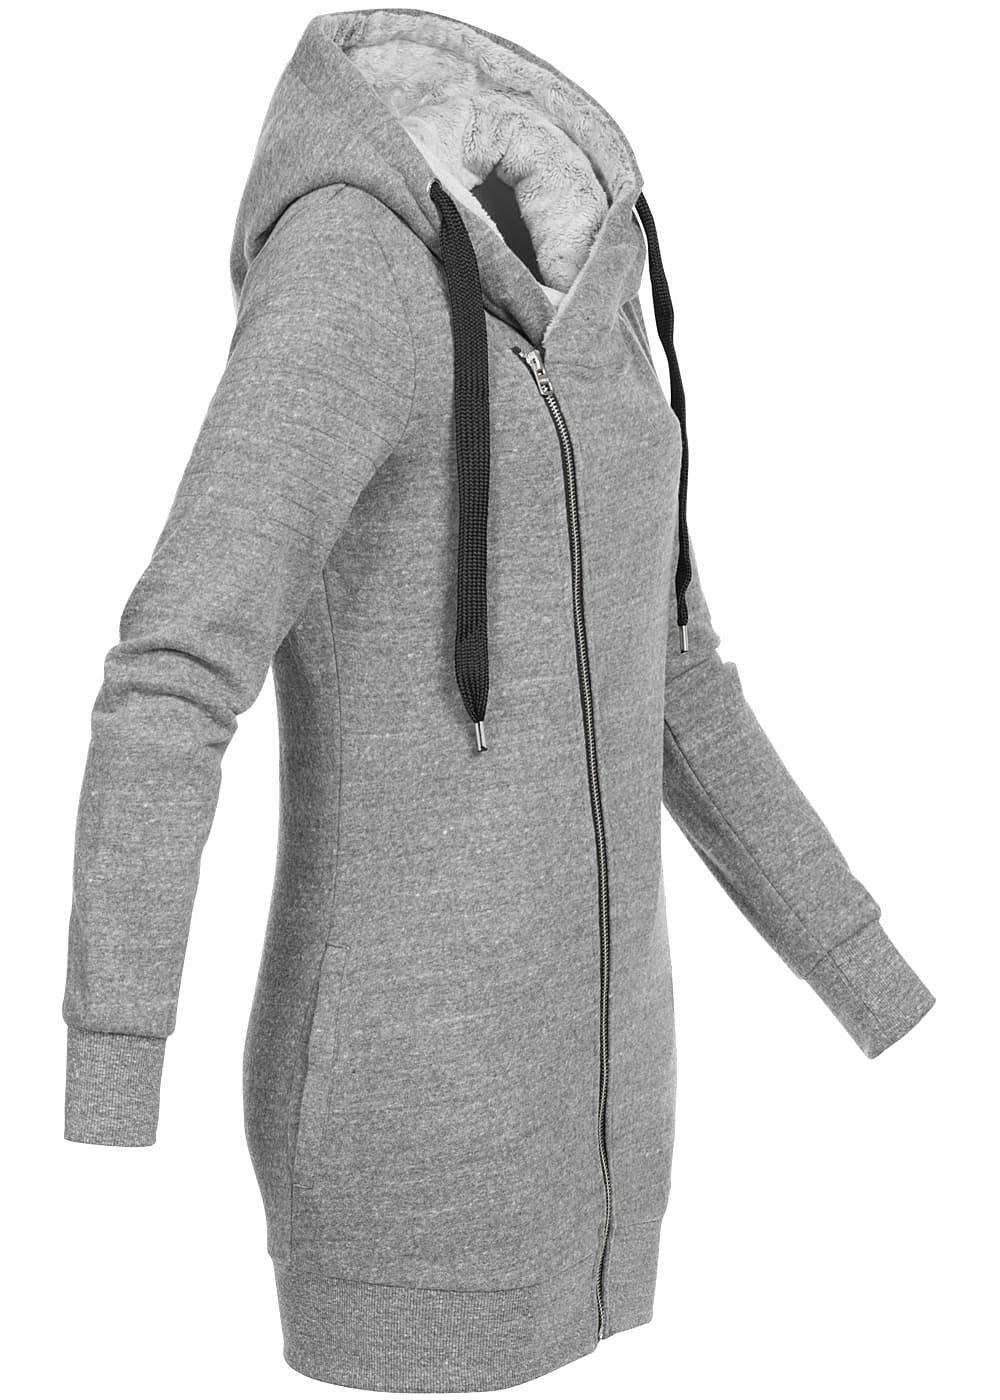 only damen zip hoodie teddyfell in kapuze 2 taschen dunkel. Black Bedroom Furniture Sets. Home Design Ideas